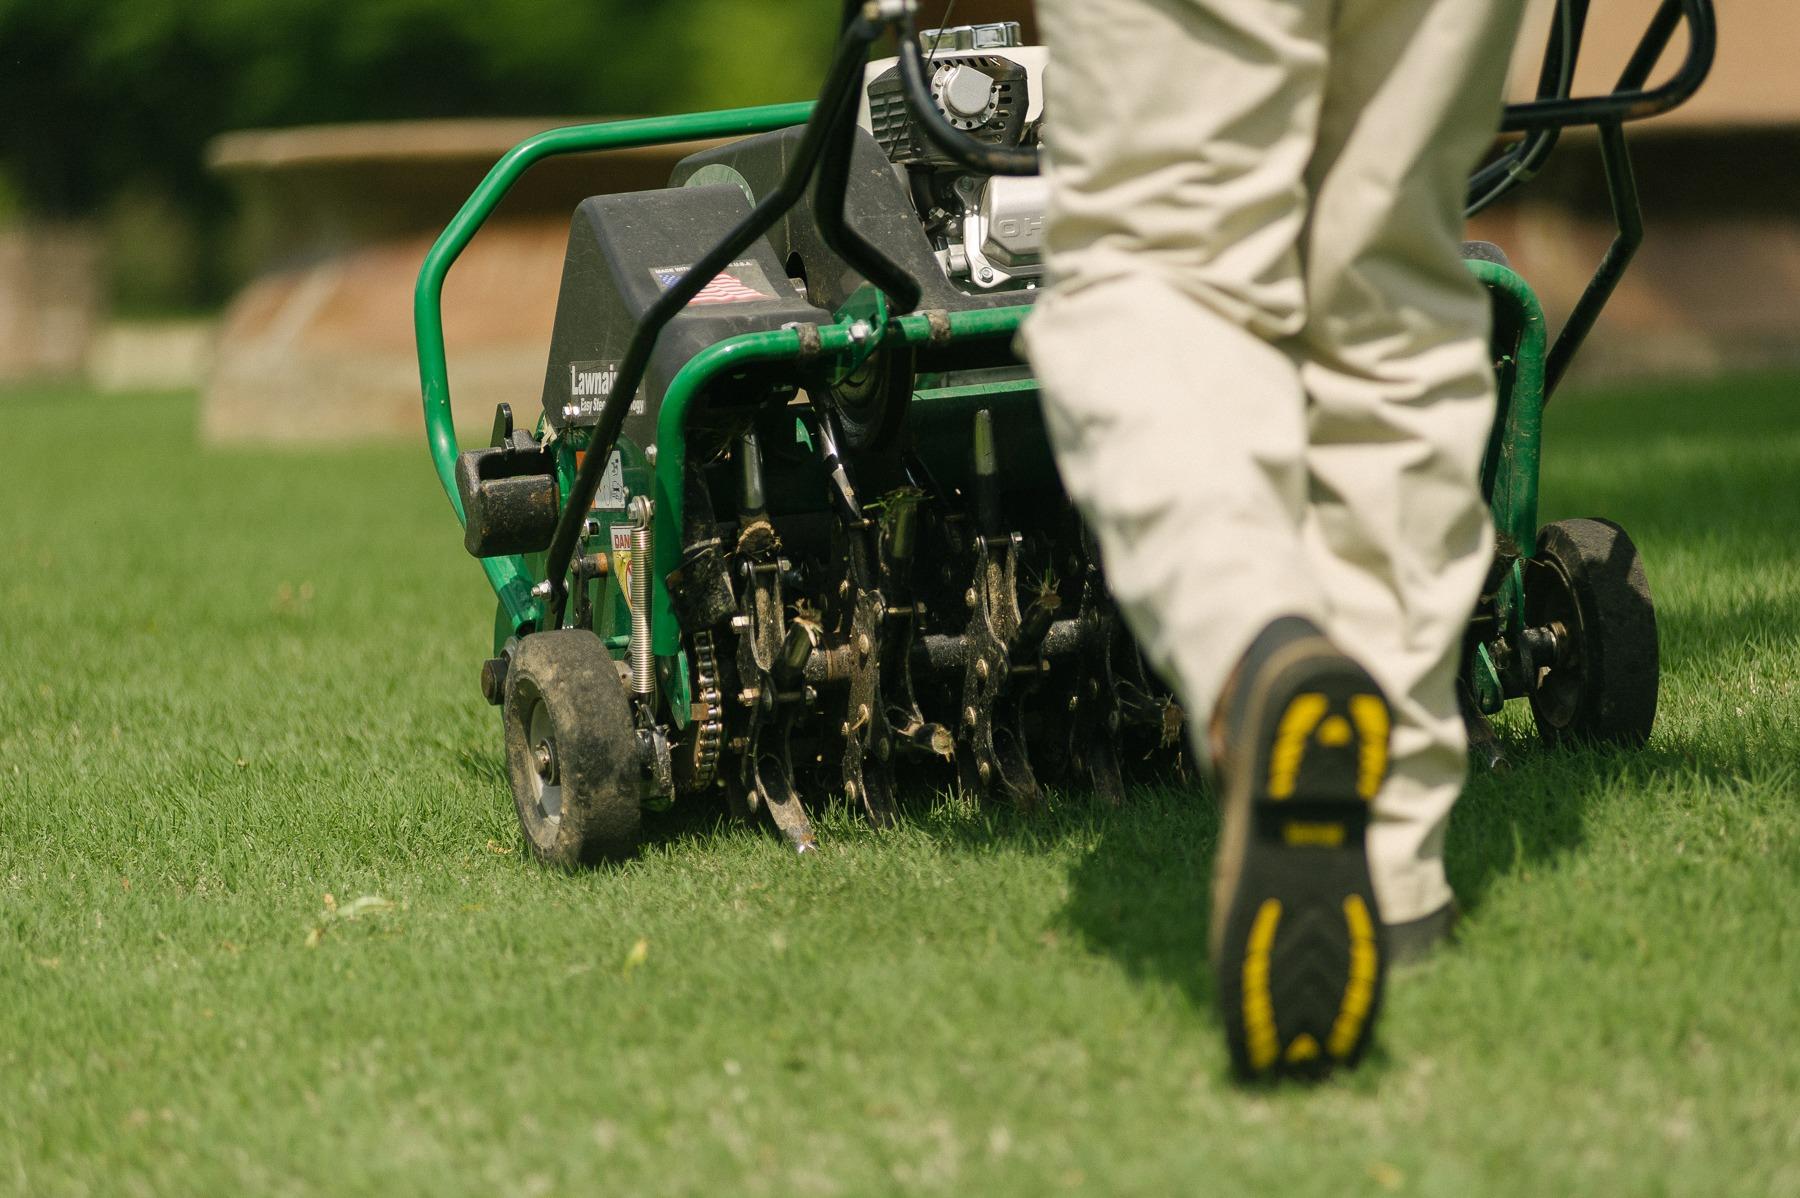 Lawn technician aerating a lawn